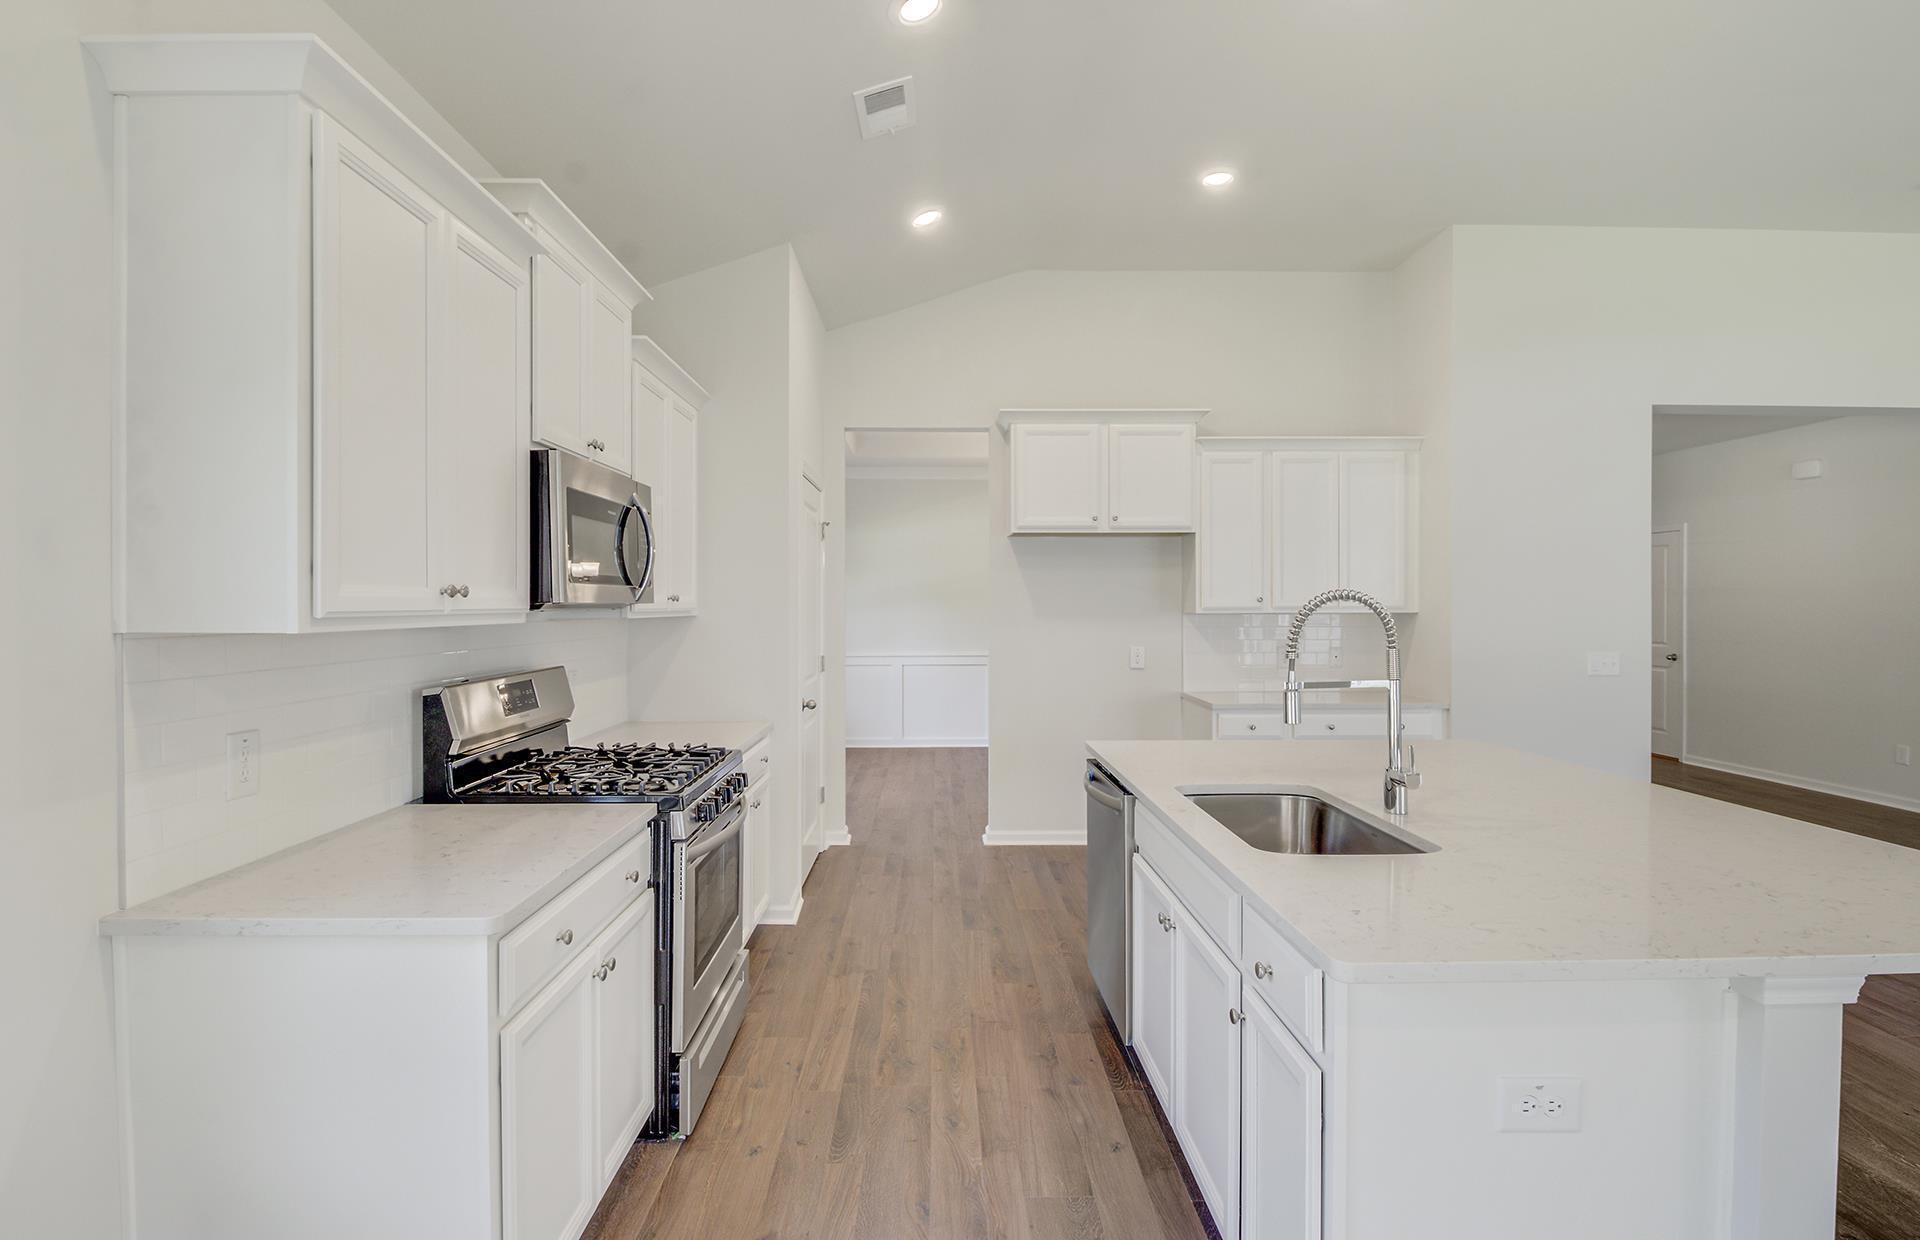 Cane Bay Plantation Homes For Sale - 205 Granton Edge, Summerville, SC - 15